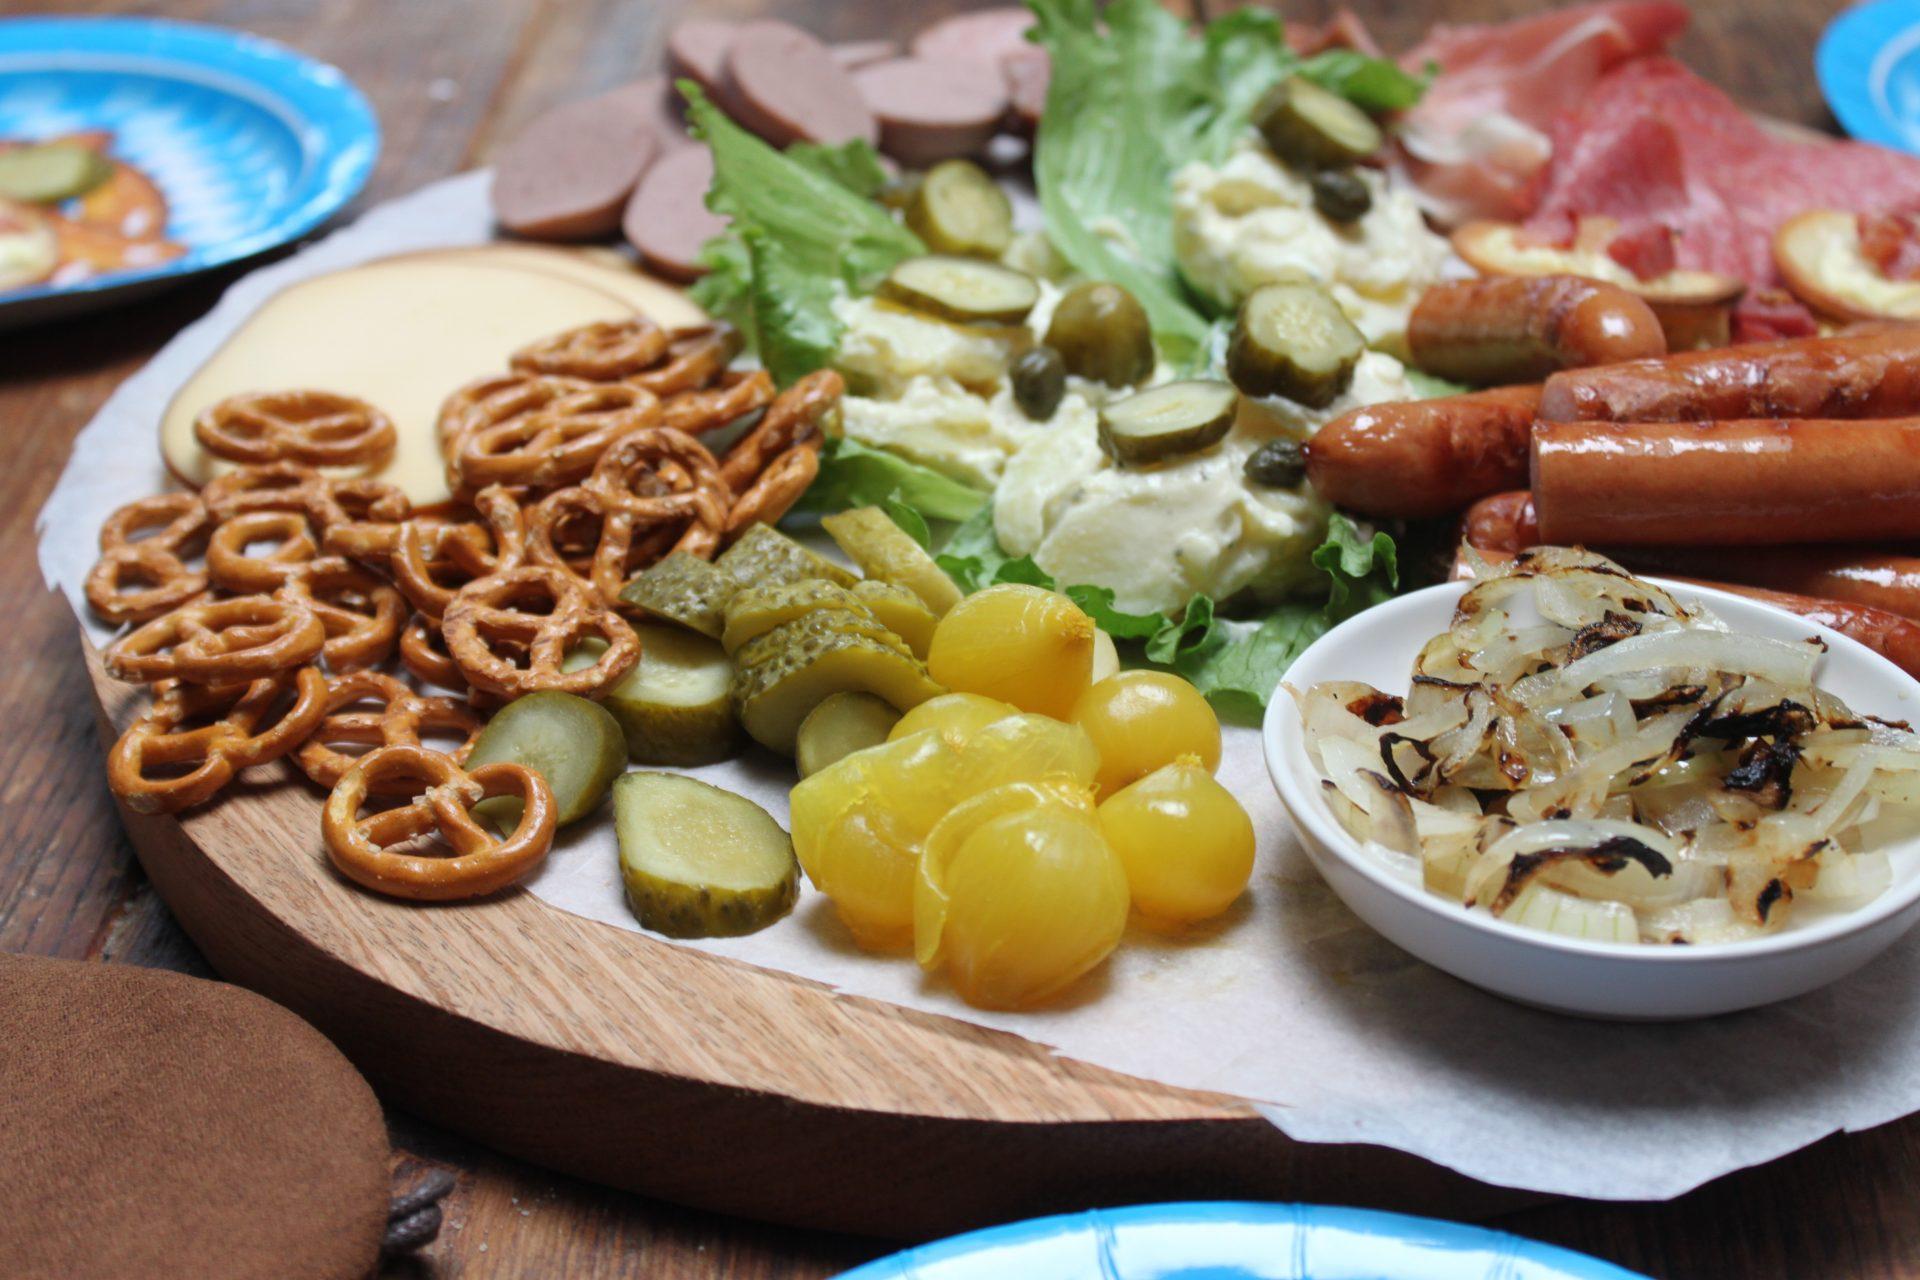 Duitse borrelplank inspiratie Oktoberfest recepten Foodblog Foodinista